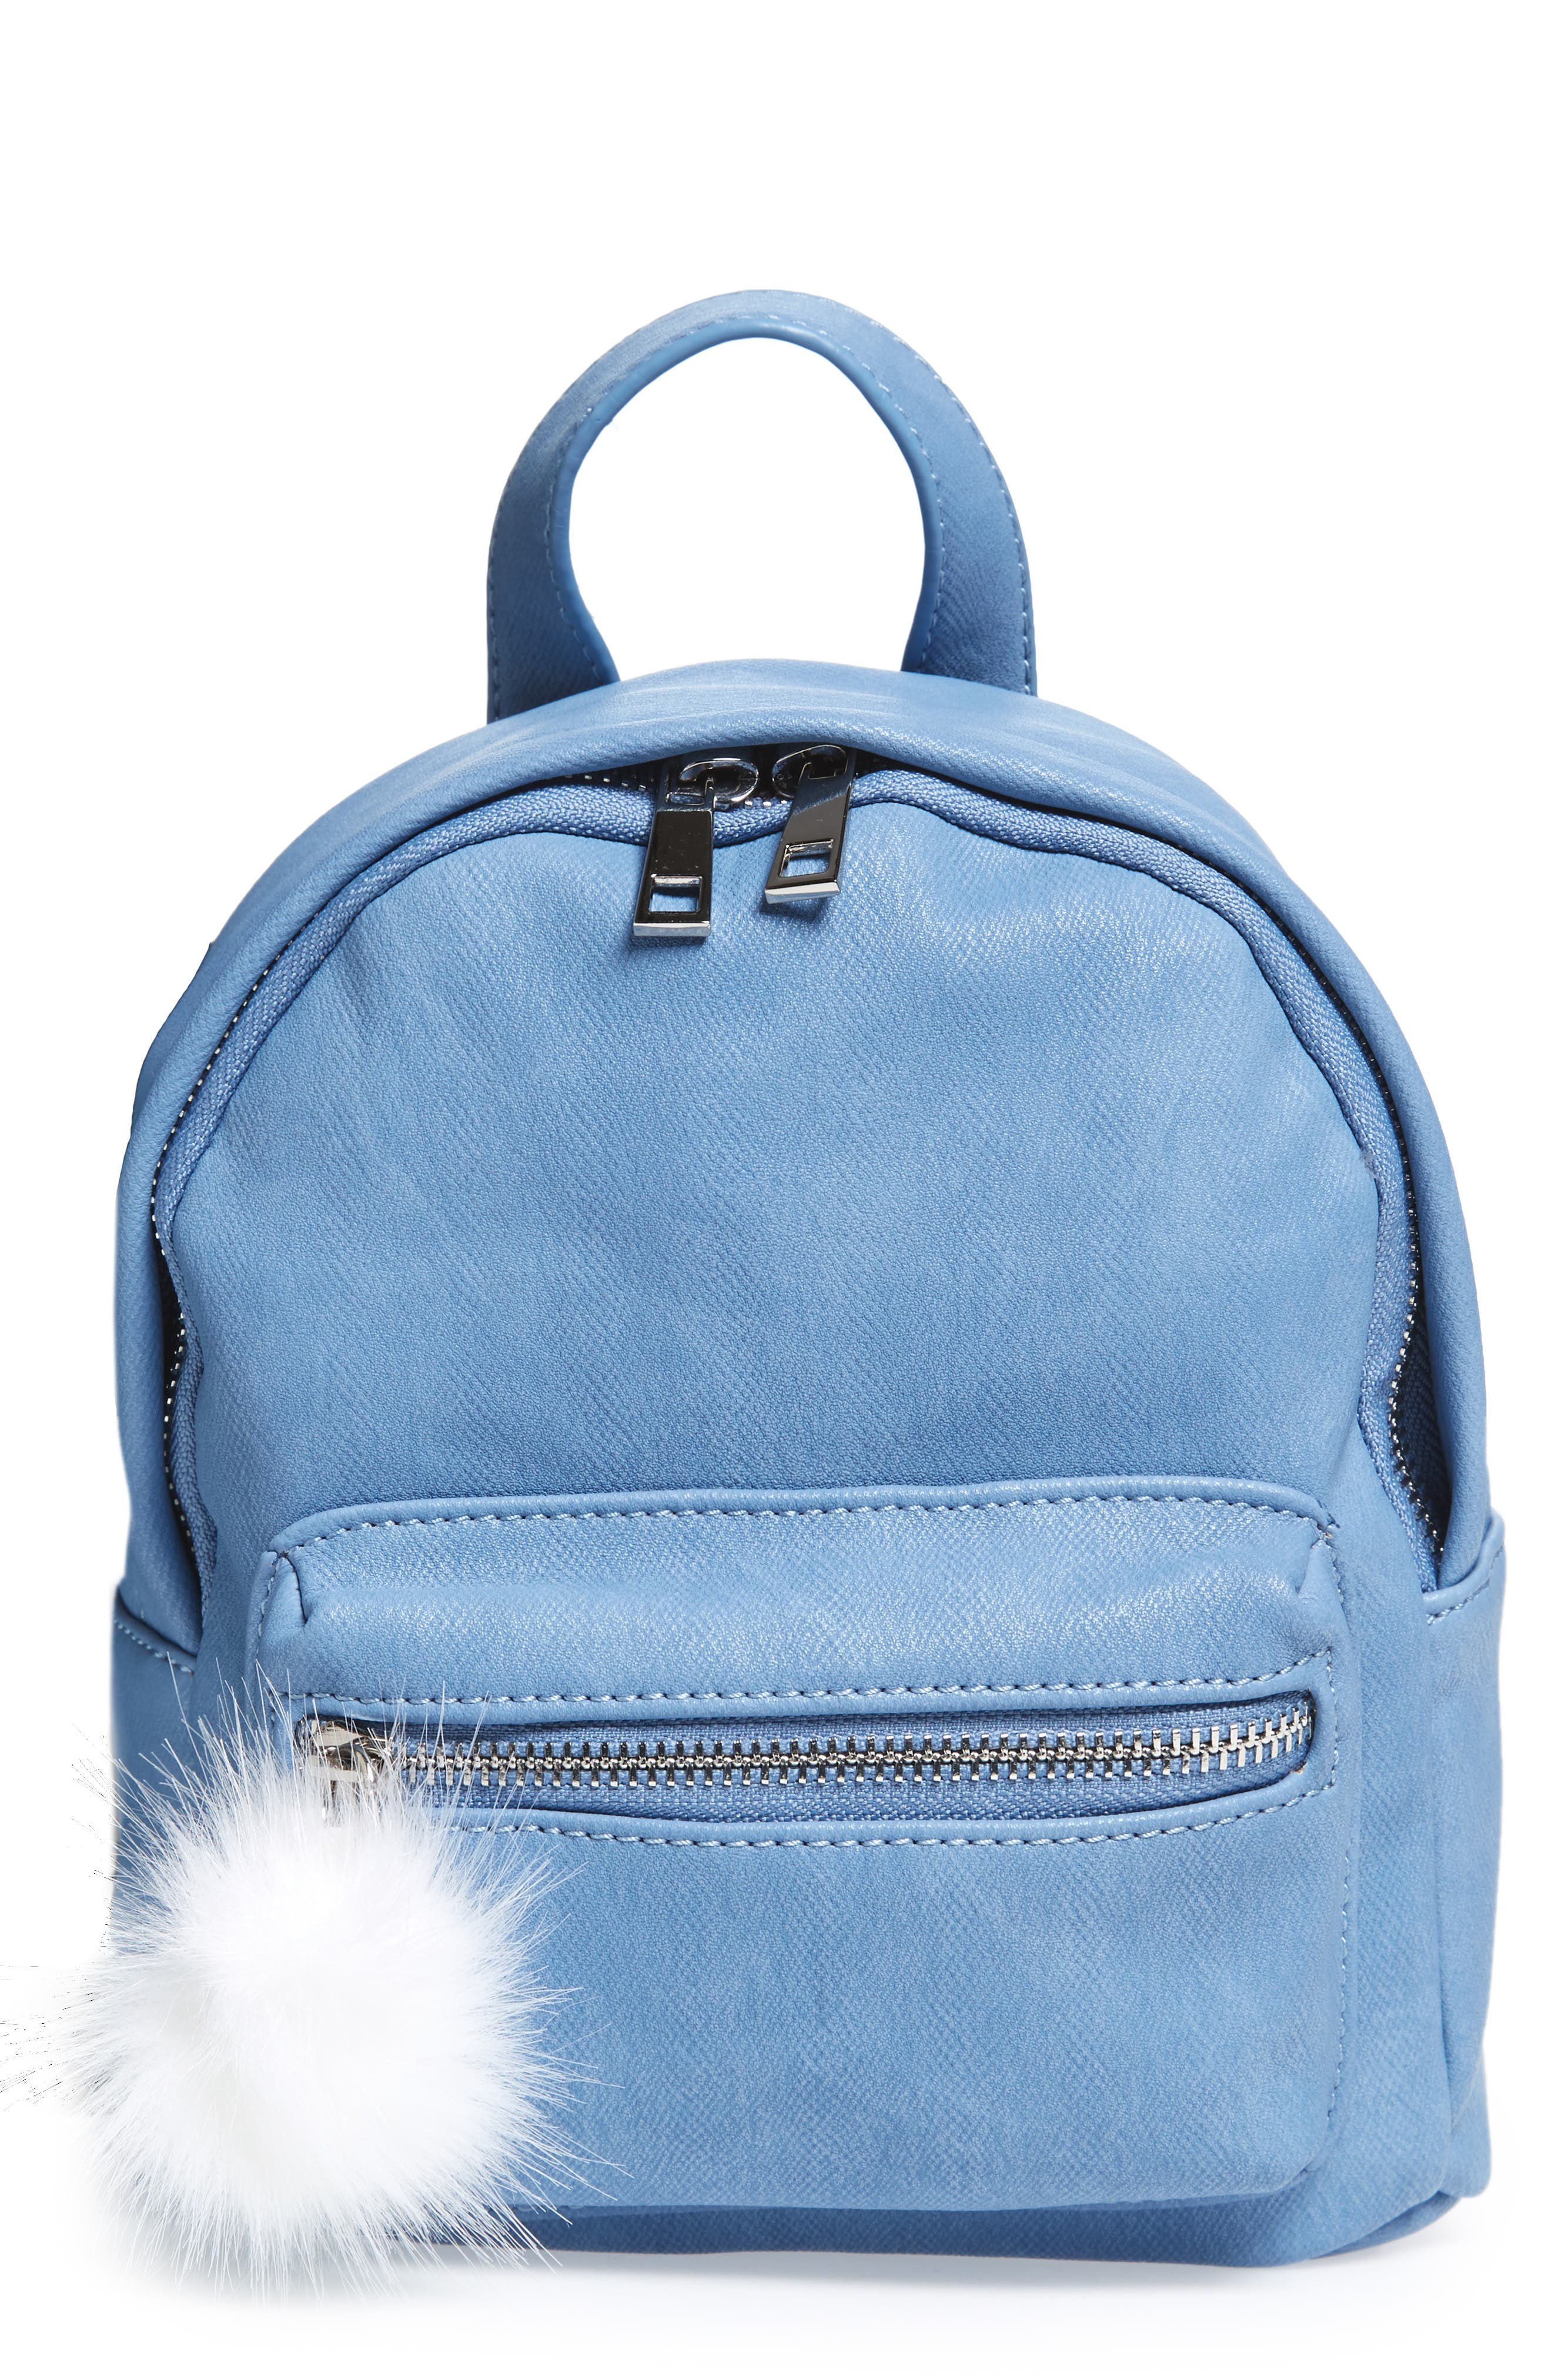 Faux Leather Mini Backpack,                             Main thumbnail 3, color,